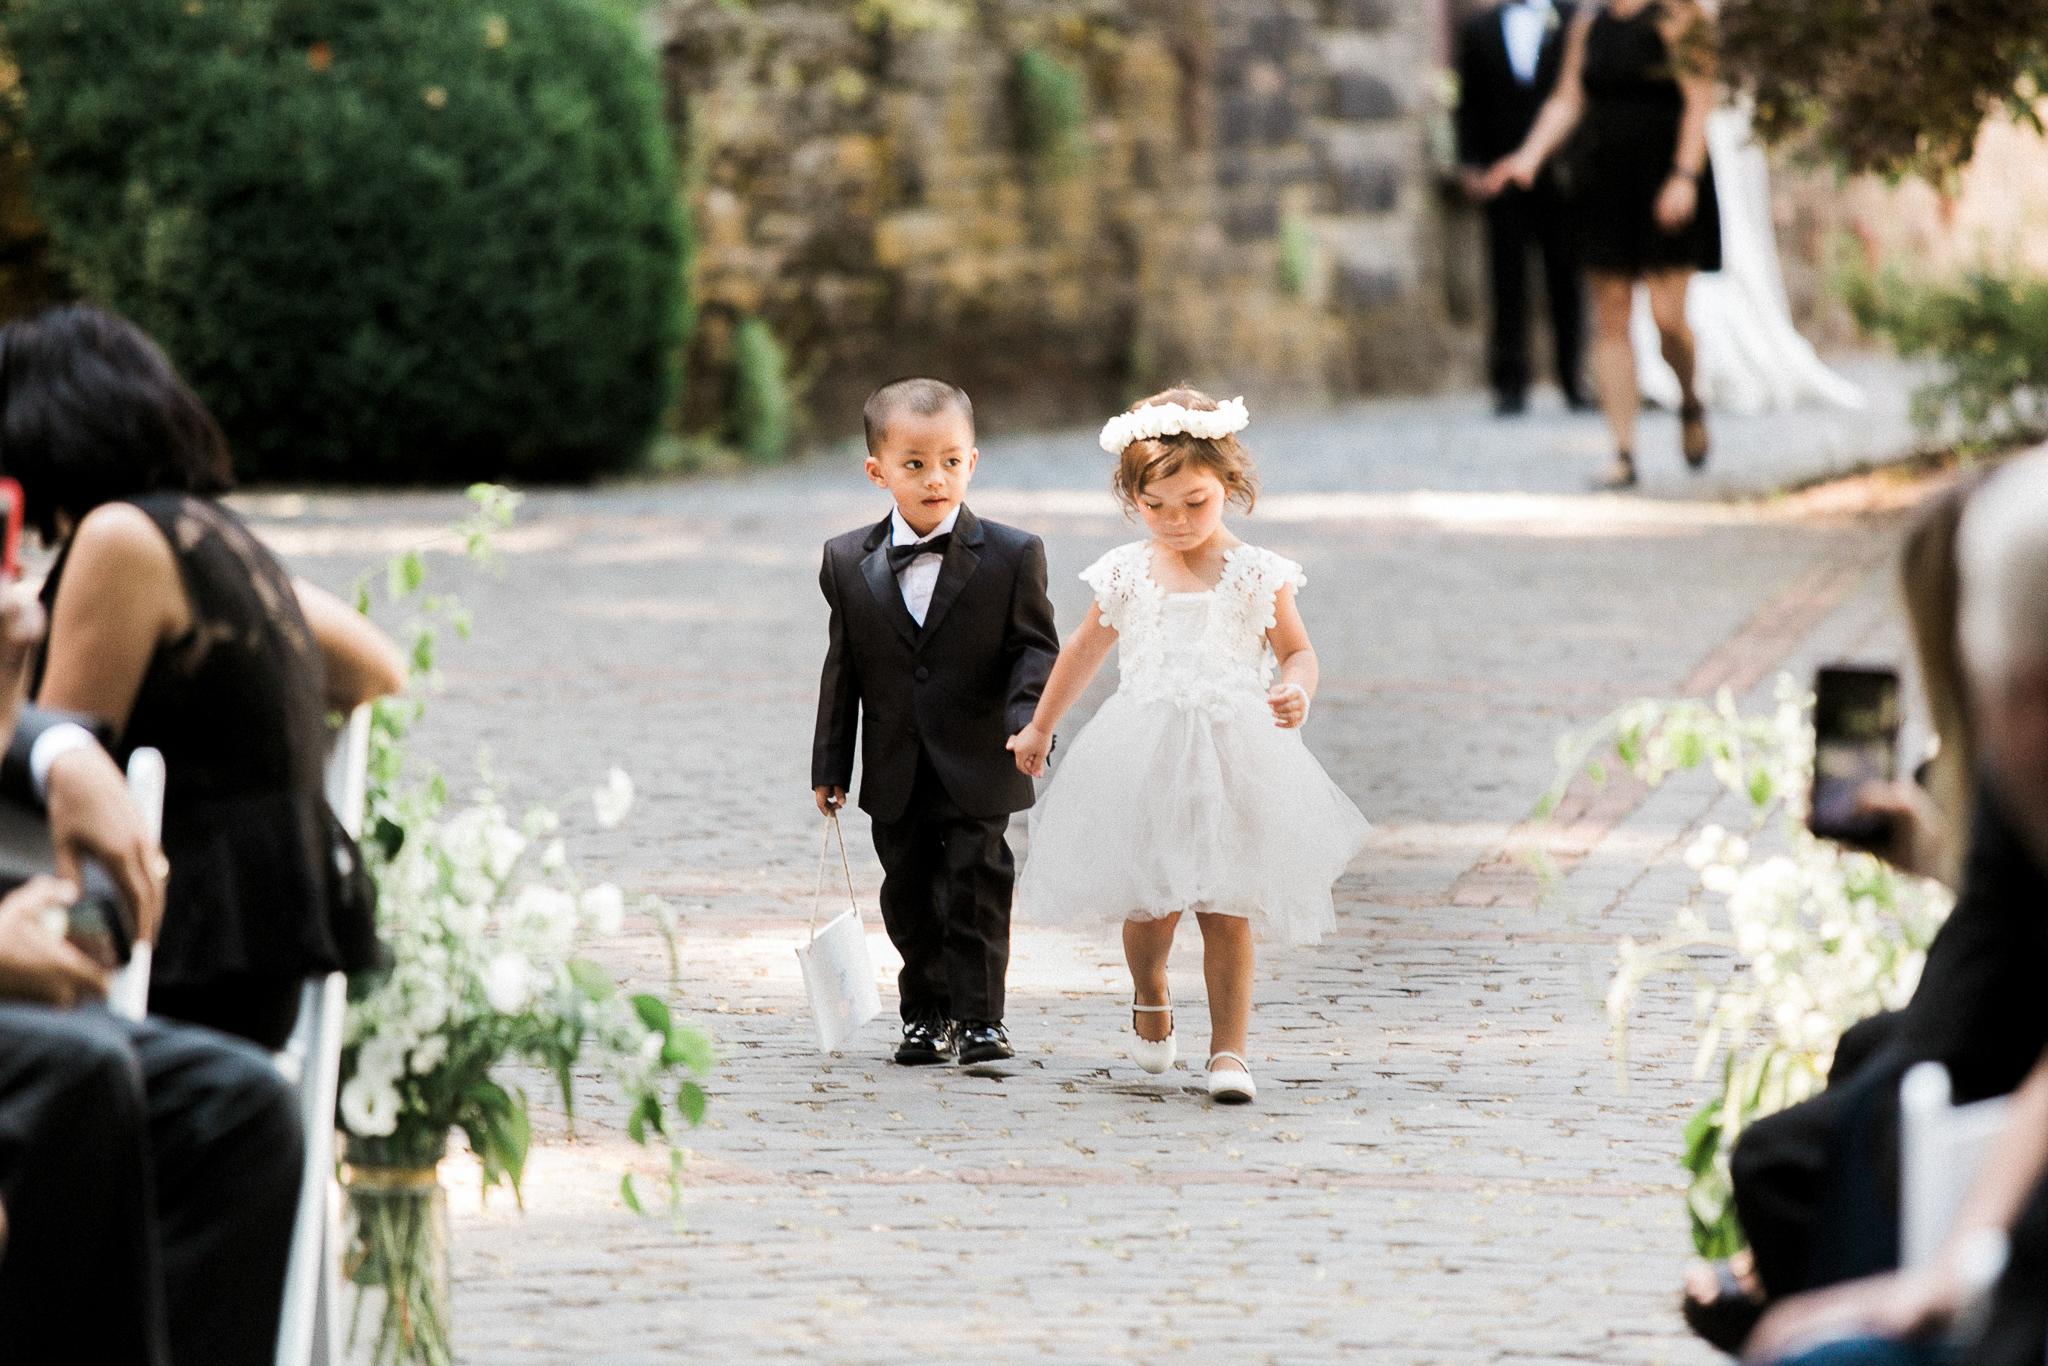 131OutliveCreative_Travel_Photographer_Videographer_Lewis&Clark_Oregon_Elegant_BlackTie_Destination_Wedding.jpg